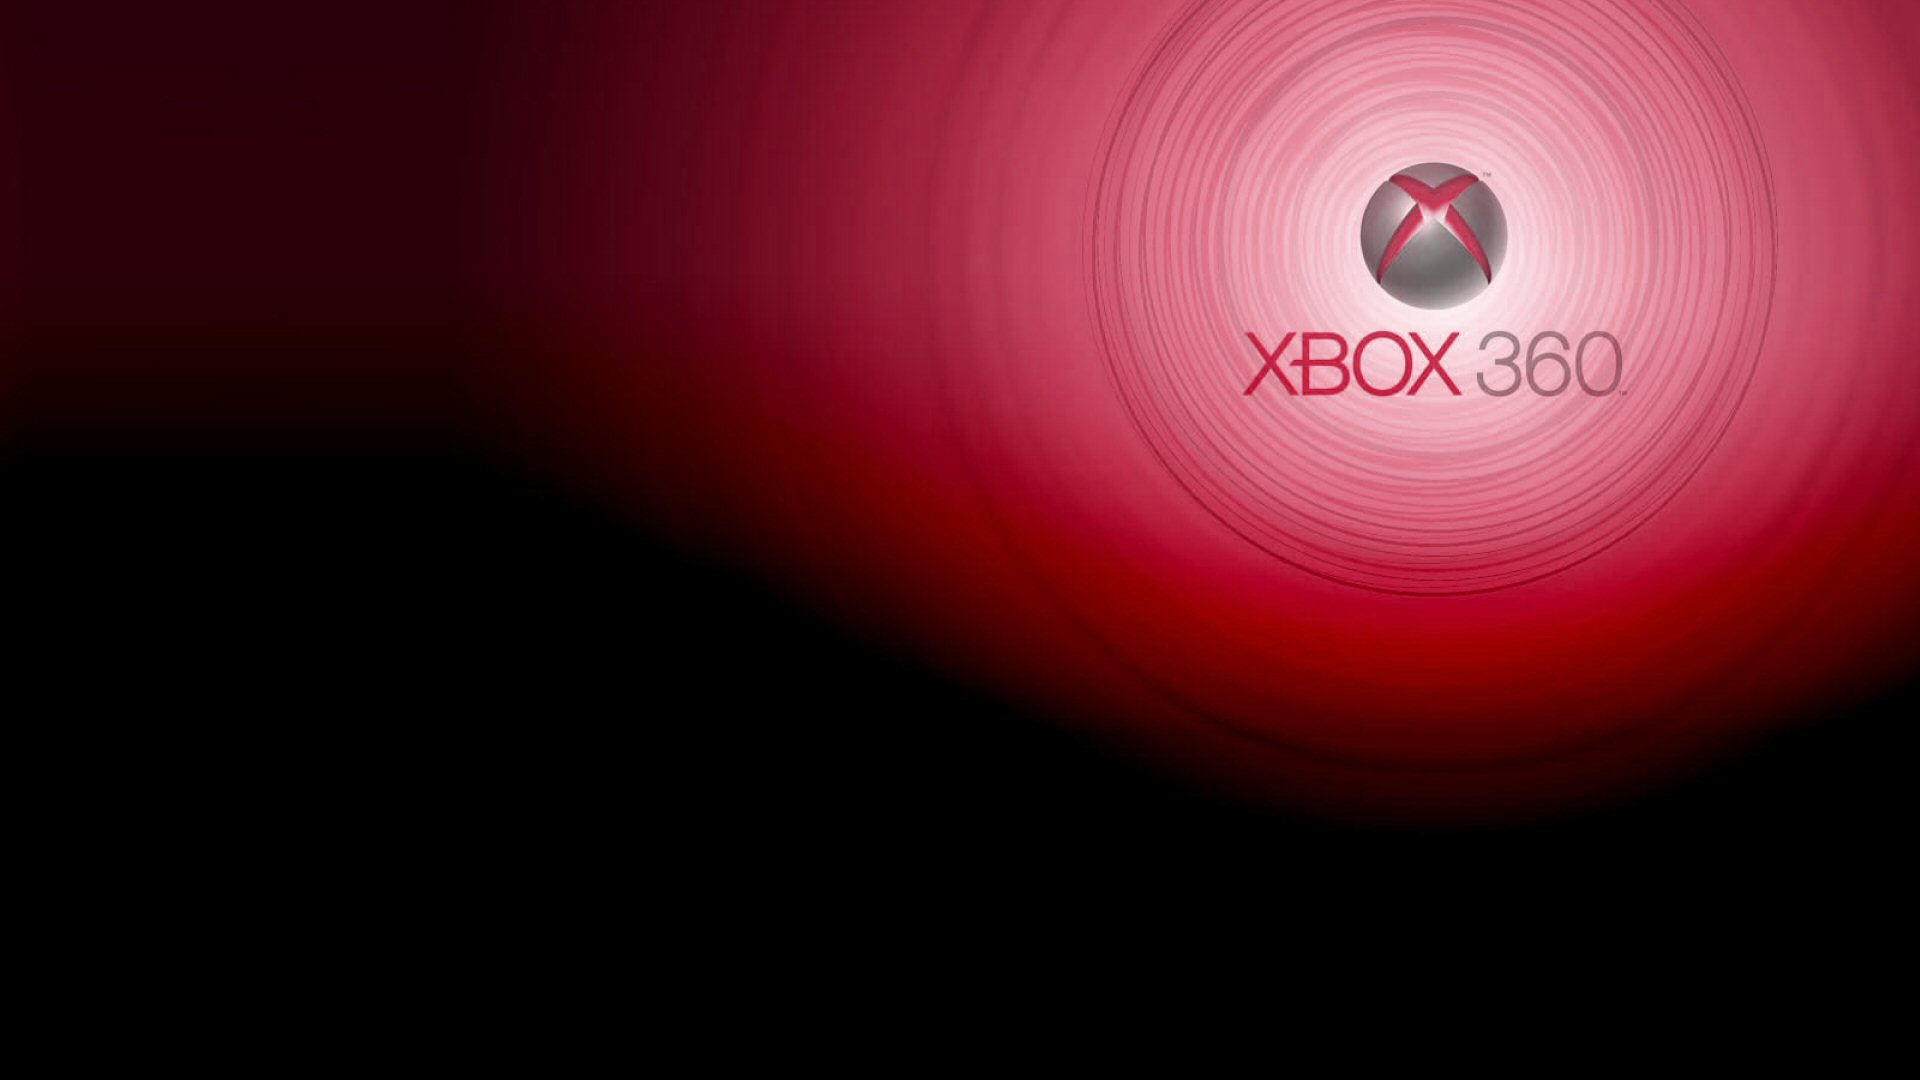 XBox 360 Logo Wallpapers 1920x1080